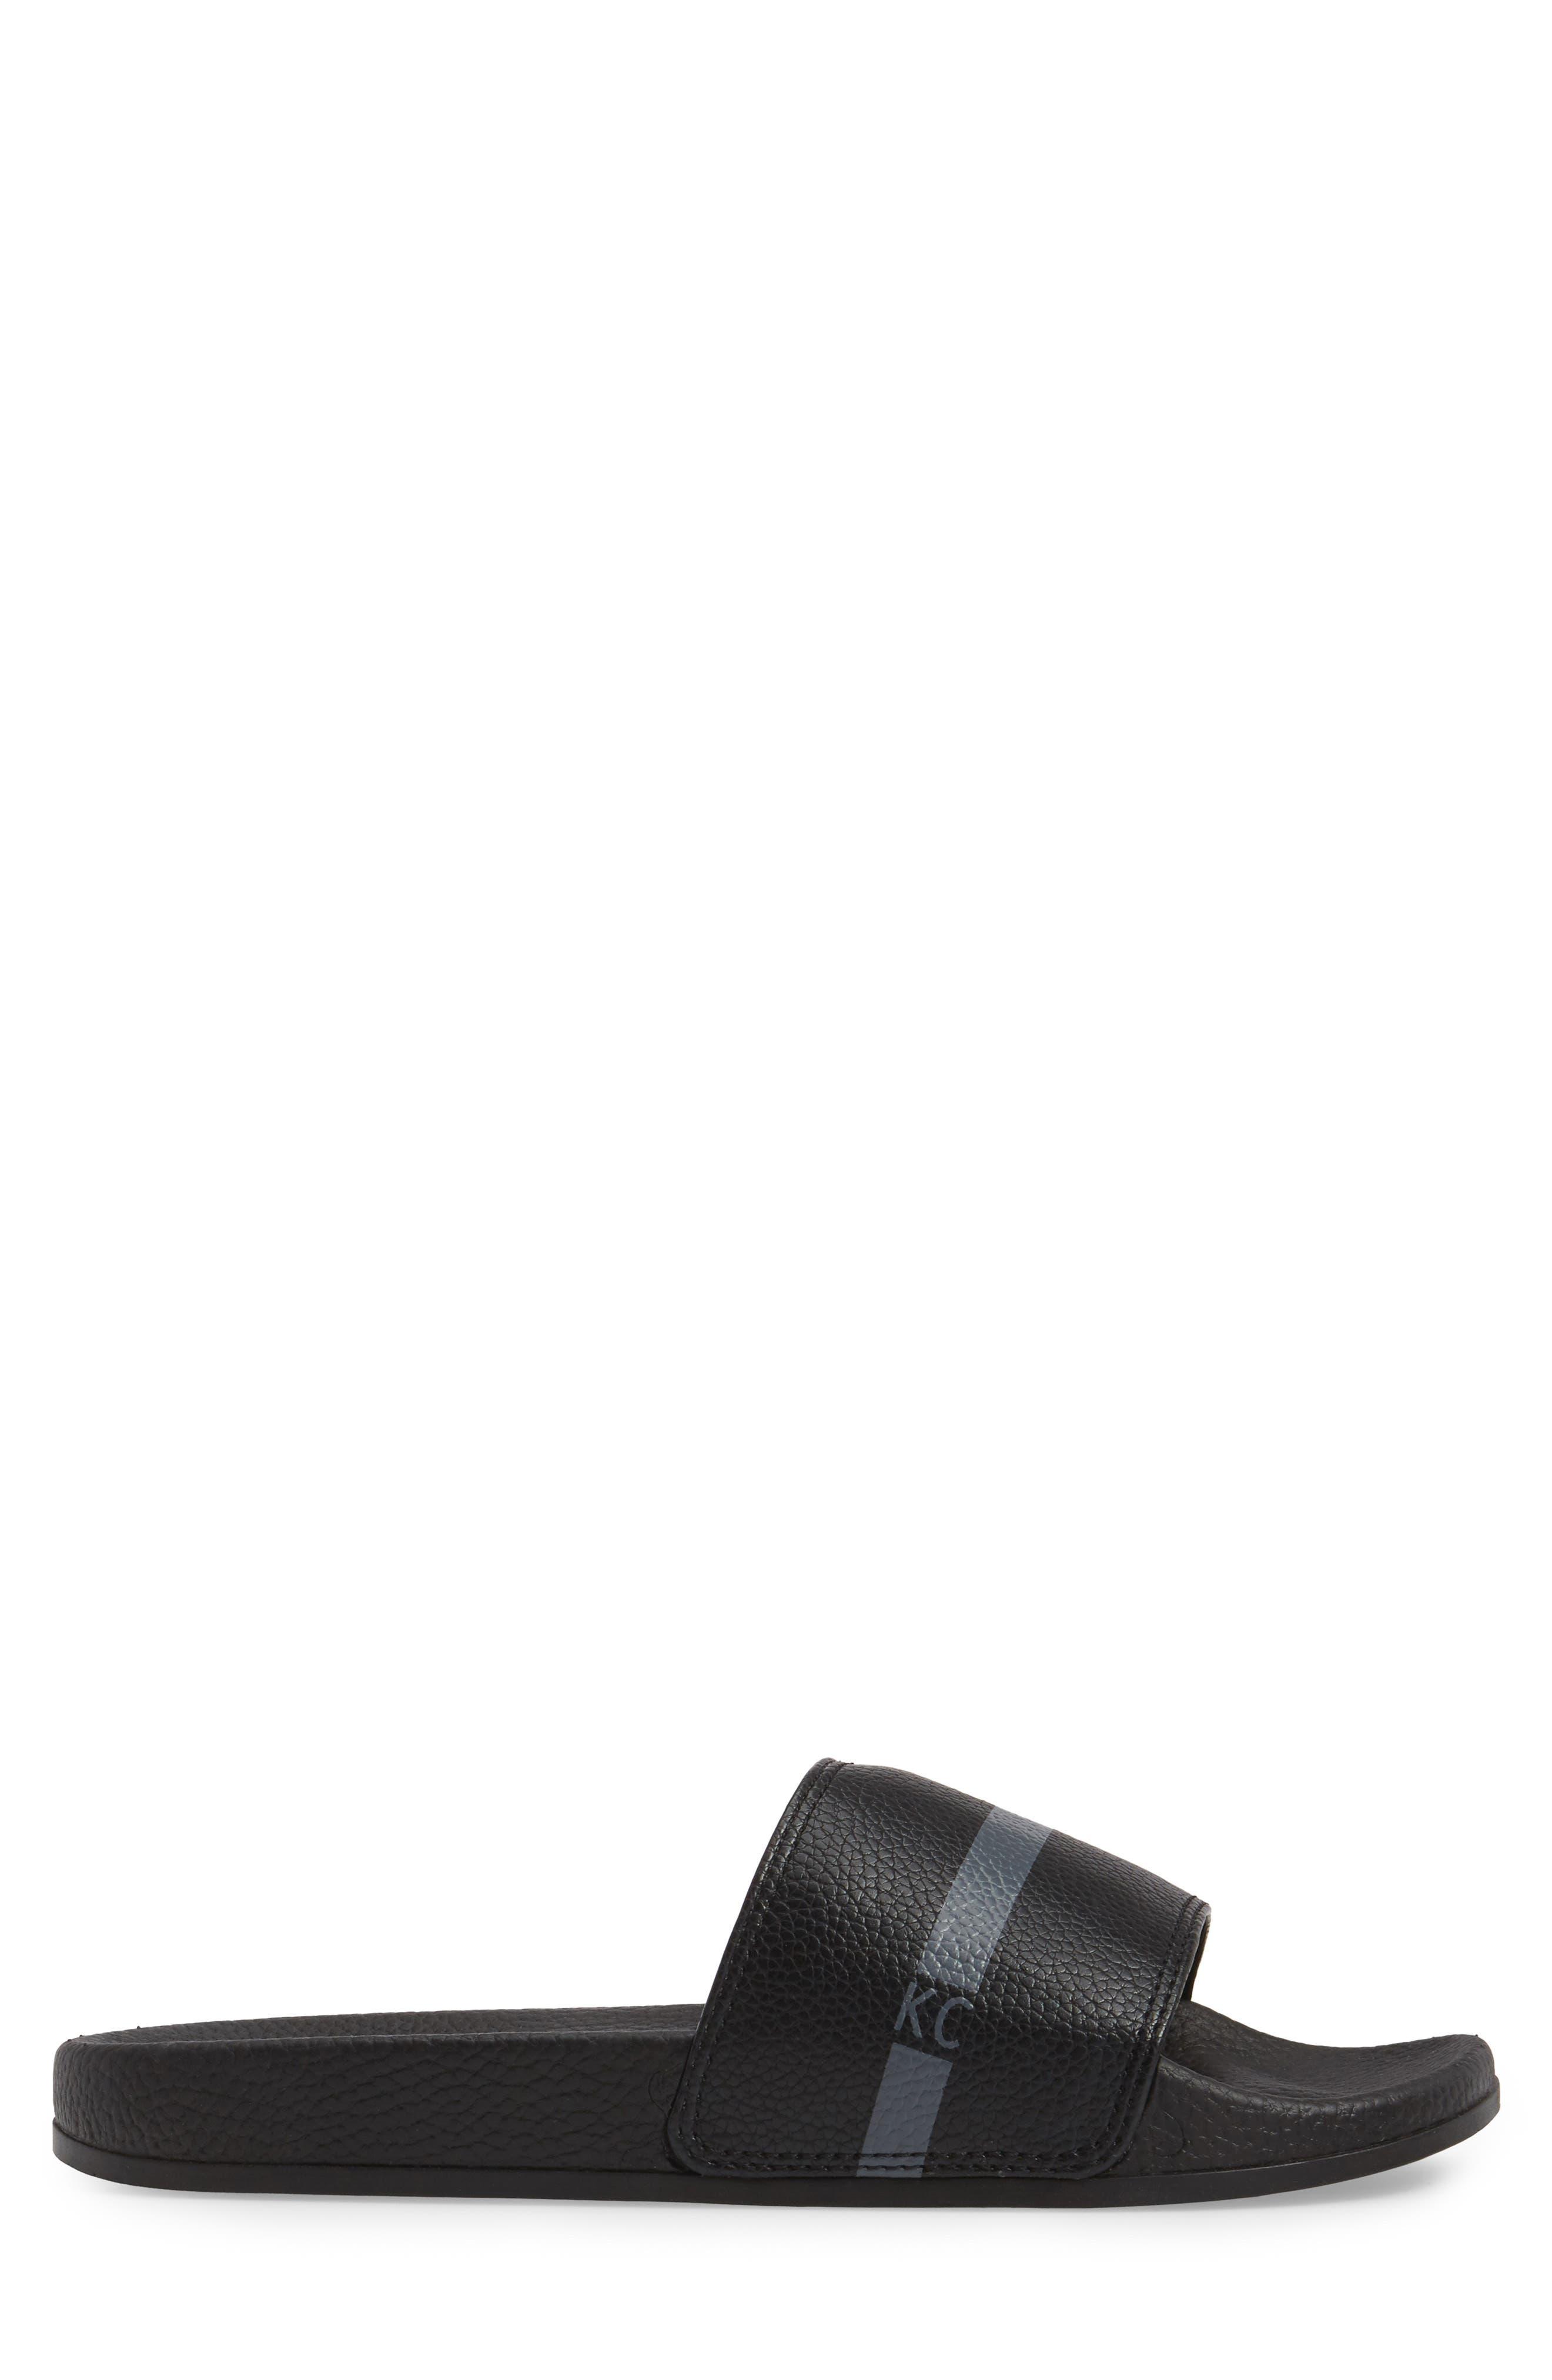 Big Screen Slide Sandal,                             Alternate thumbnail 3, color,                             Black